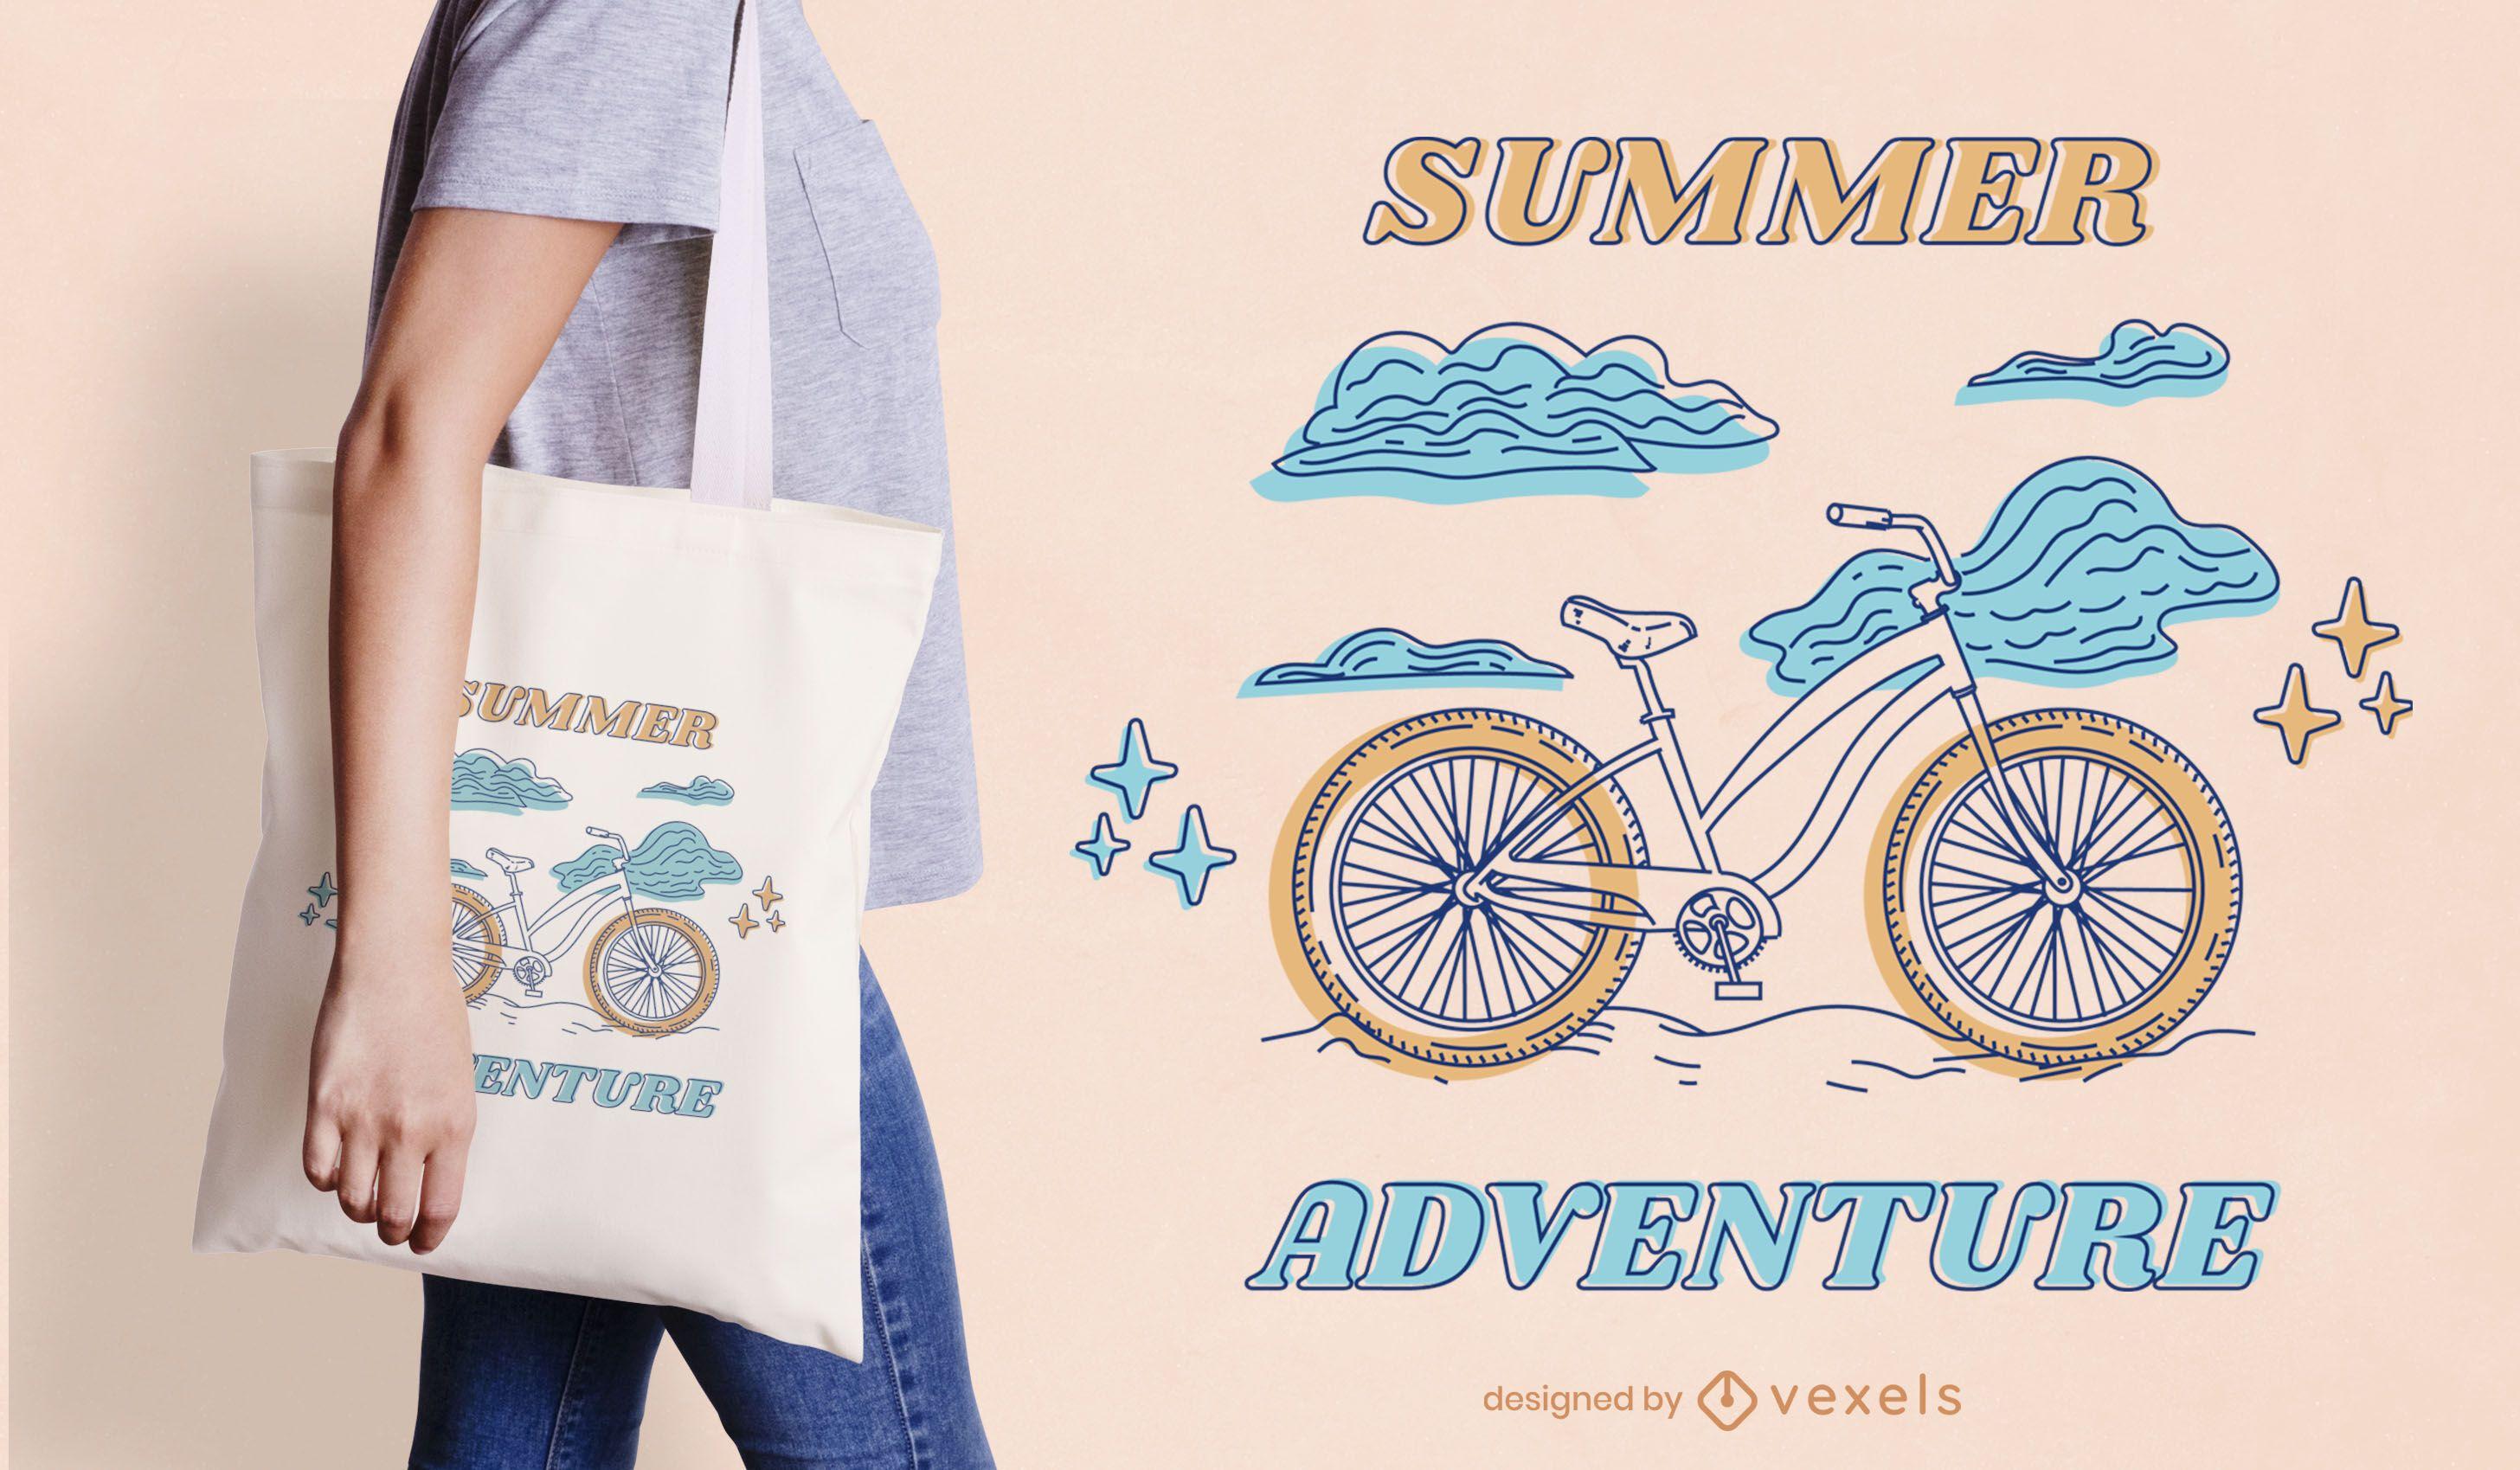 Diseño de bolso de mano de verano de arte de línea de bicicleta.